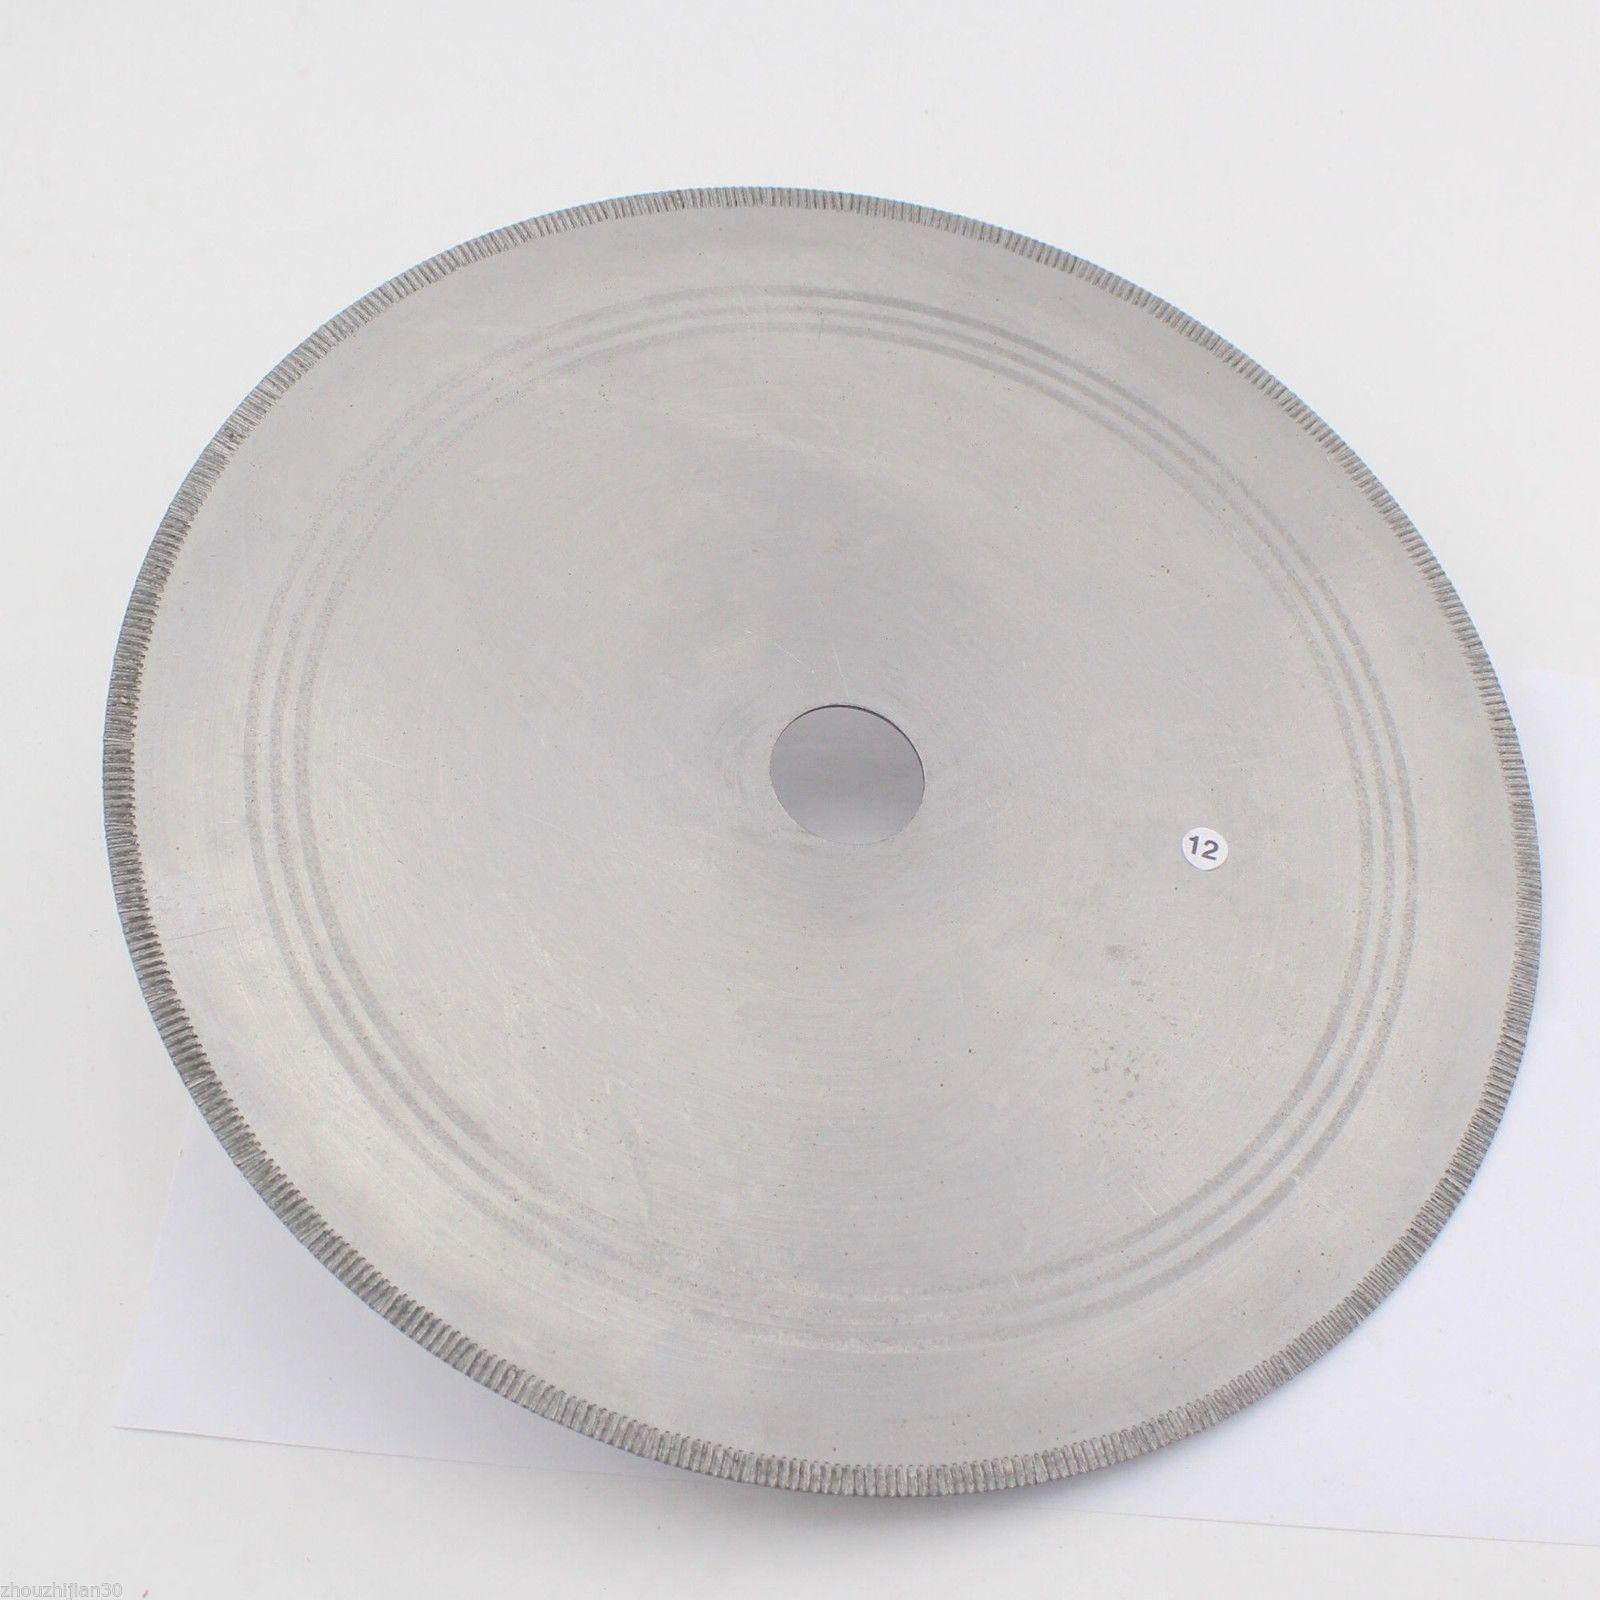 16 inch Lapidary Diamond Saw Blade Notched Rim 1.6mm Rock Slab Arbor 1 inch ILOVETOOL 6 inch lapidary concave arc diamond coated grinding wheel grind spherical 6 mm ilovetool